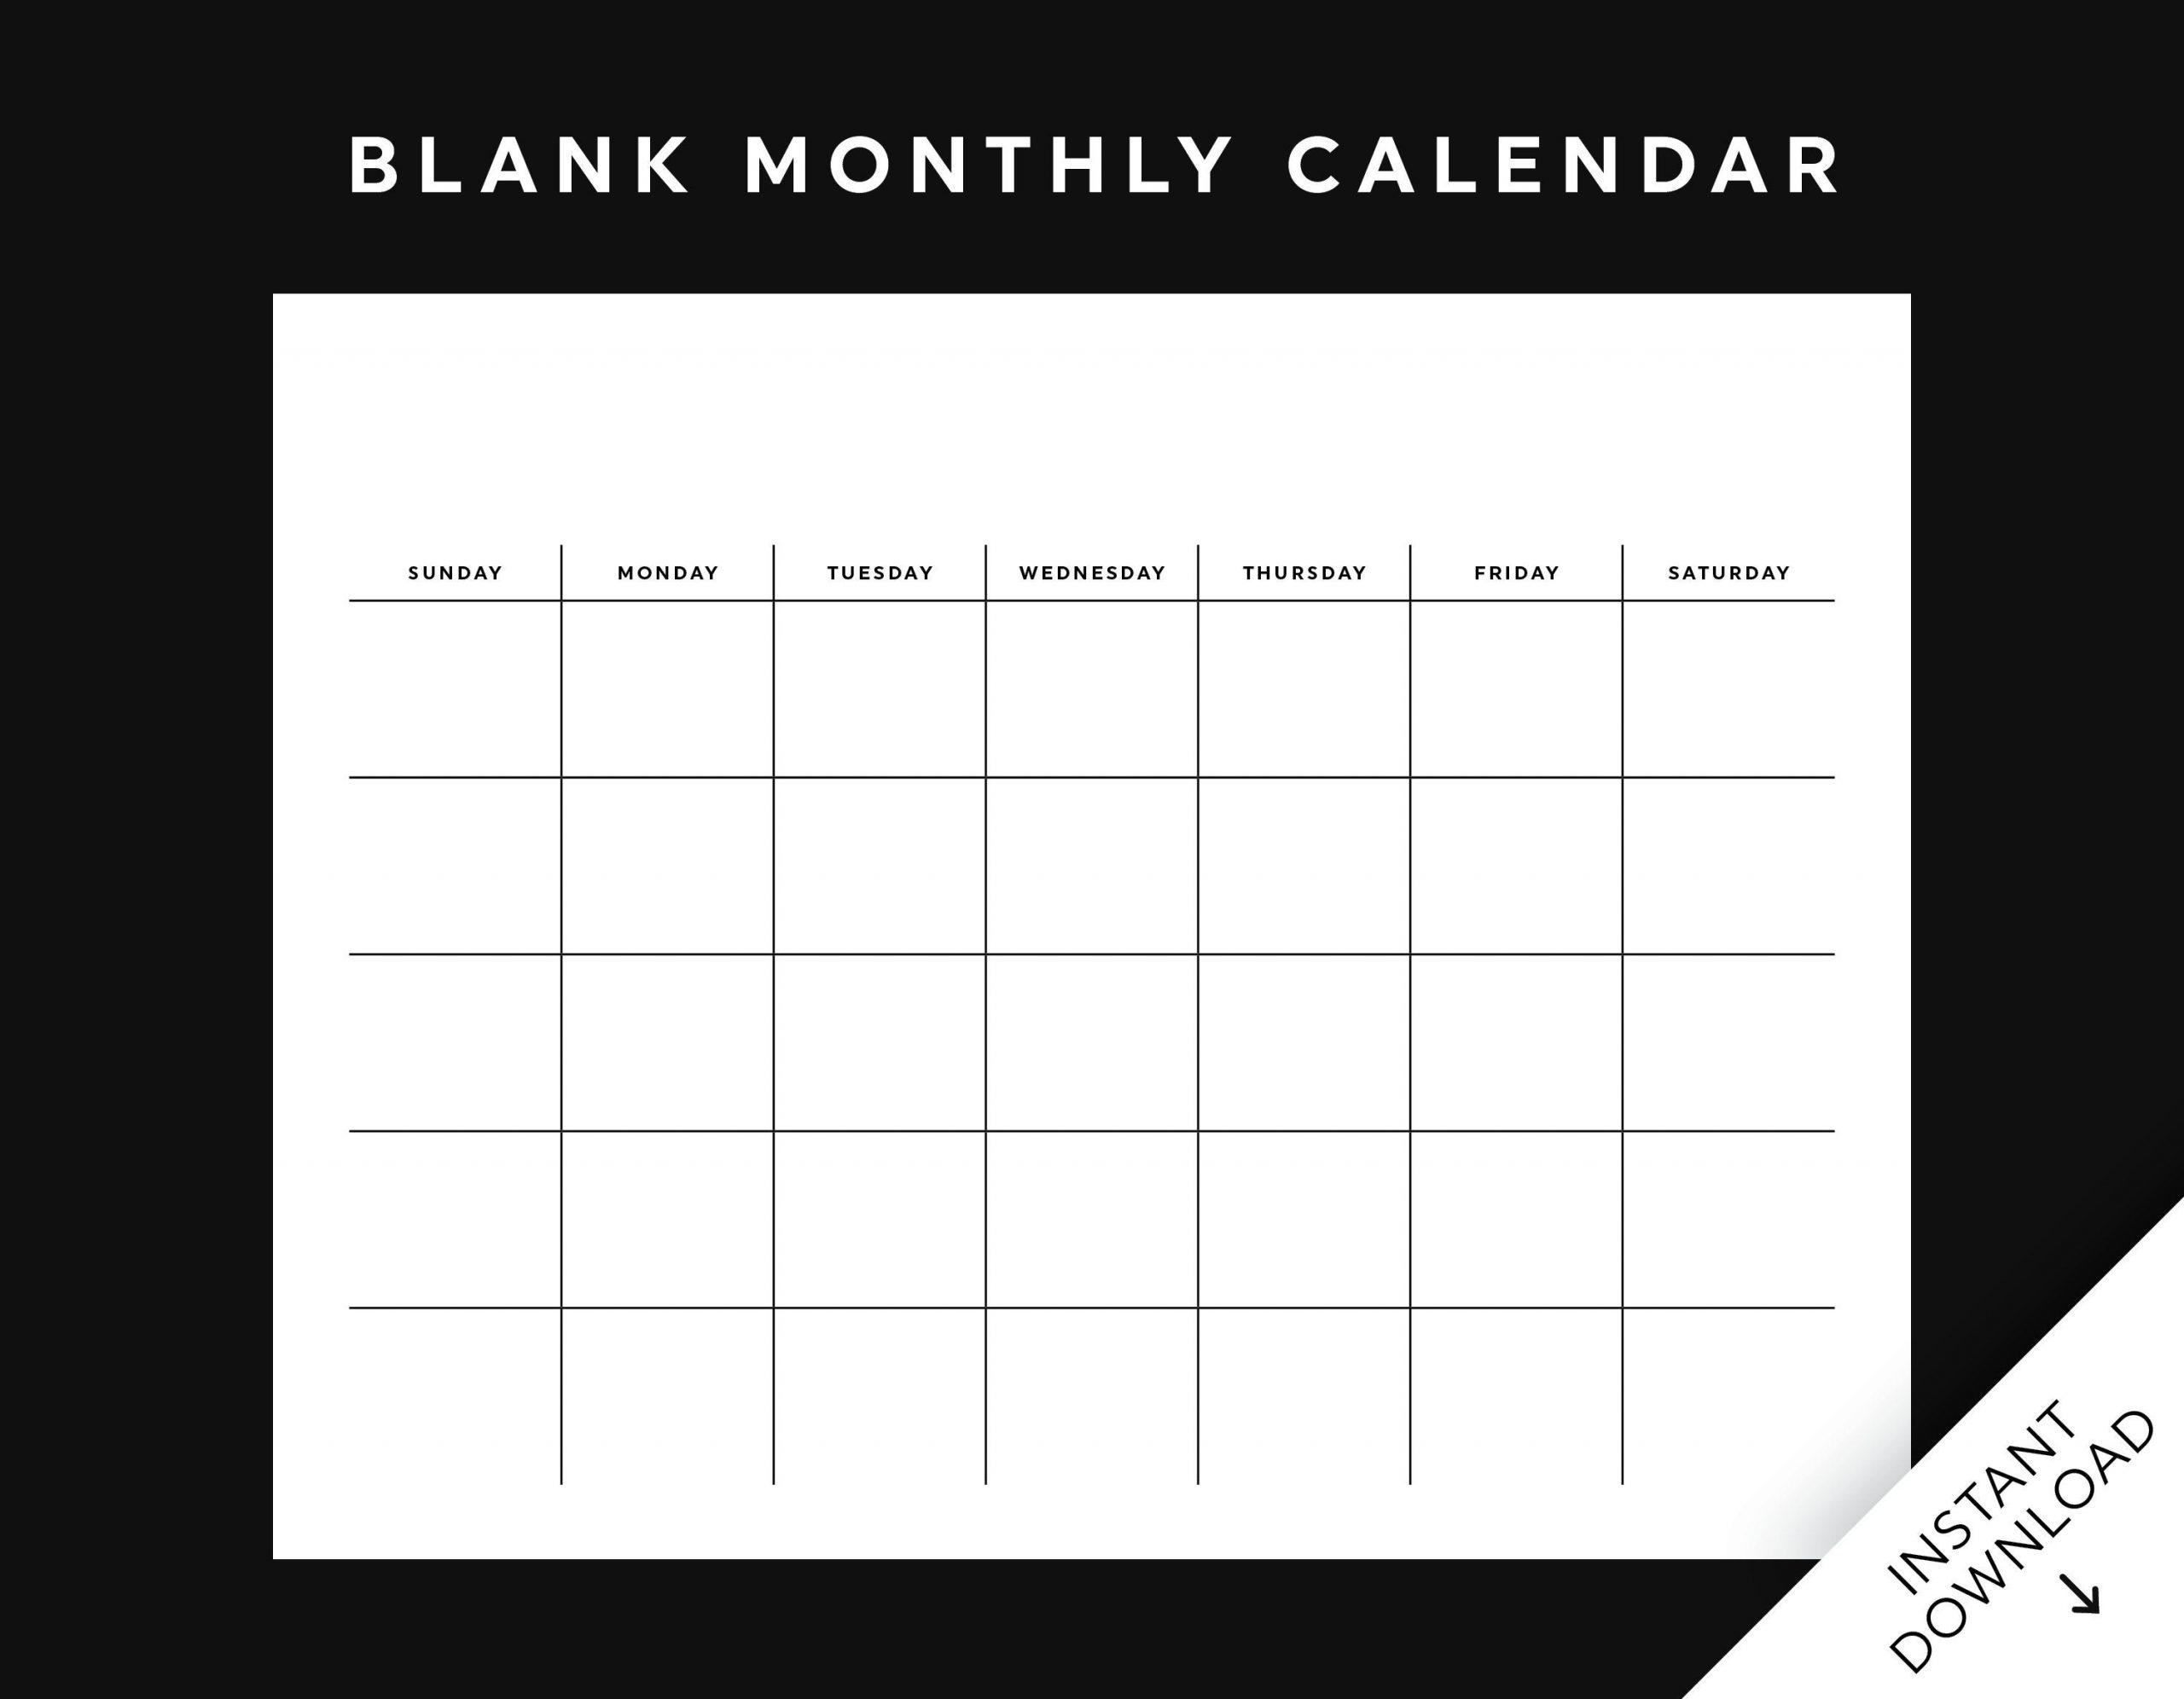 Blank Monthly Calendar Printable, Wall Calendar, Desk